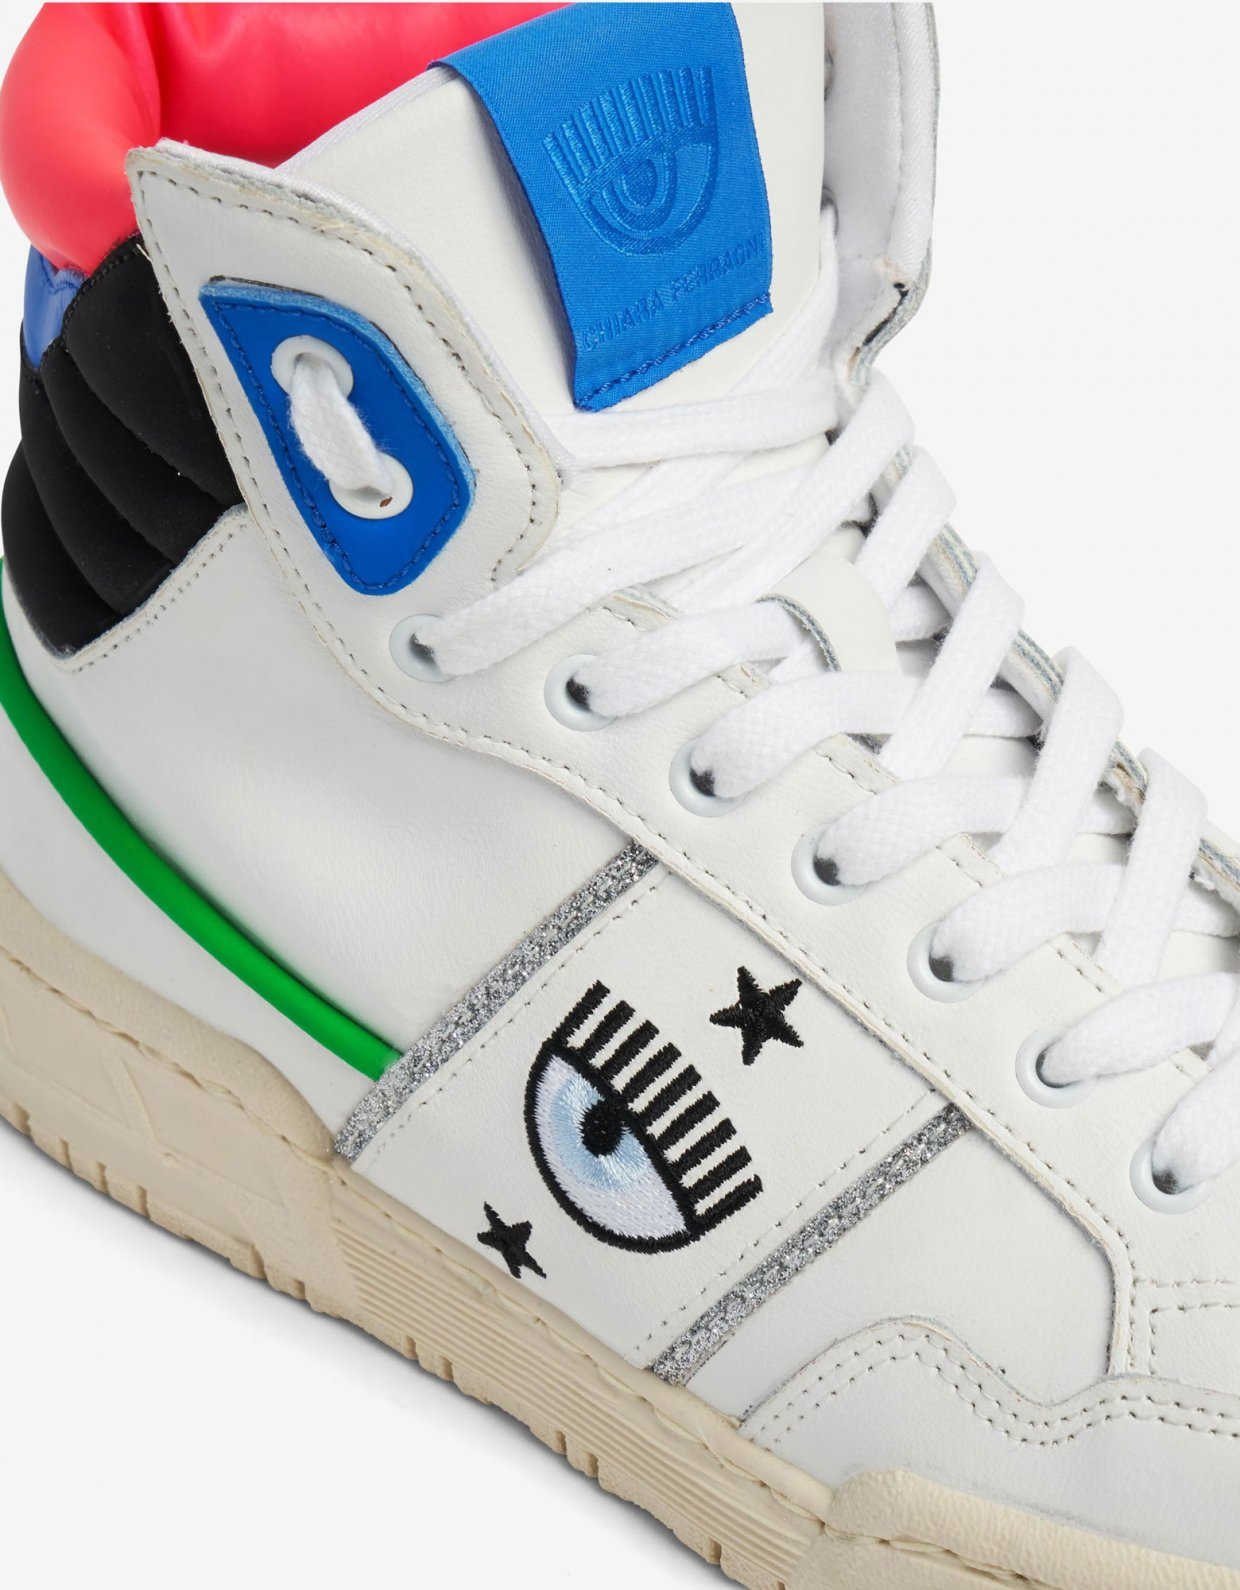 Chiara Ferragni CF1 High sneakers